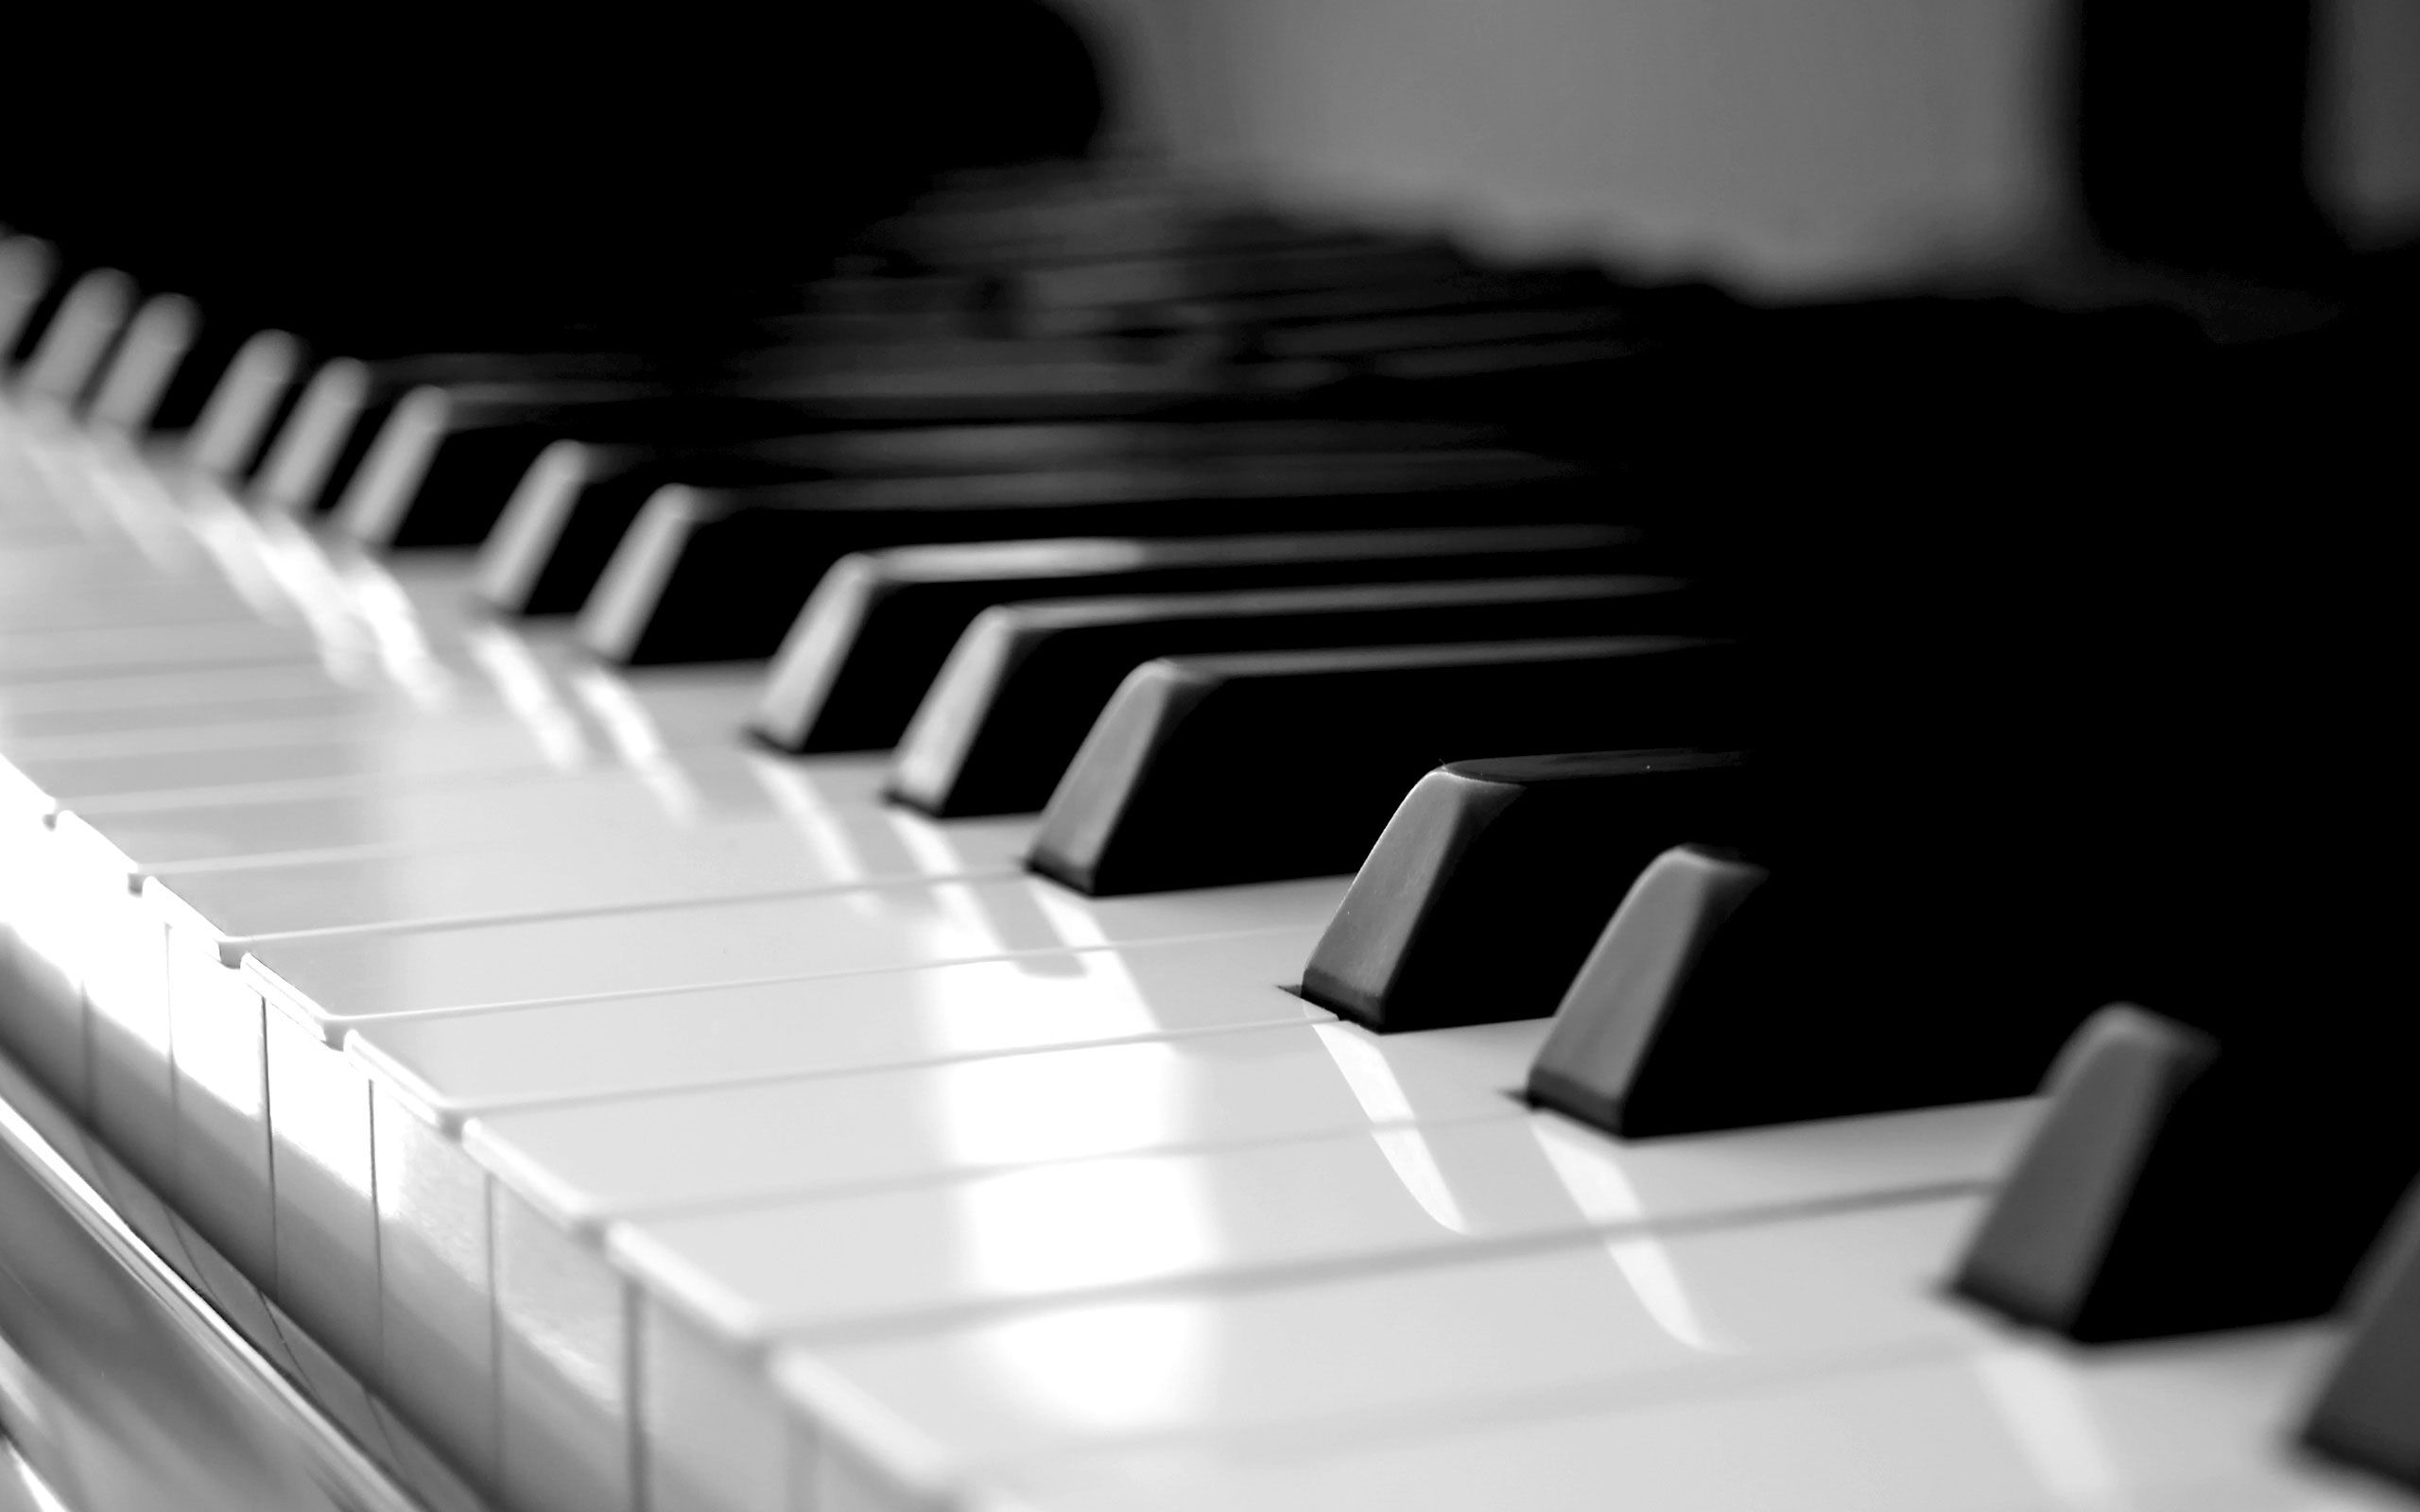 Piano Keyboard Grandpiano Console Furniture Flychord Digitalpiano Elegantdigitalpiano 88keys Fullsize Bench Piano Music Keyboard Piano Sheet Music